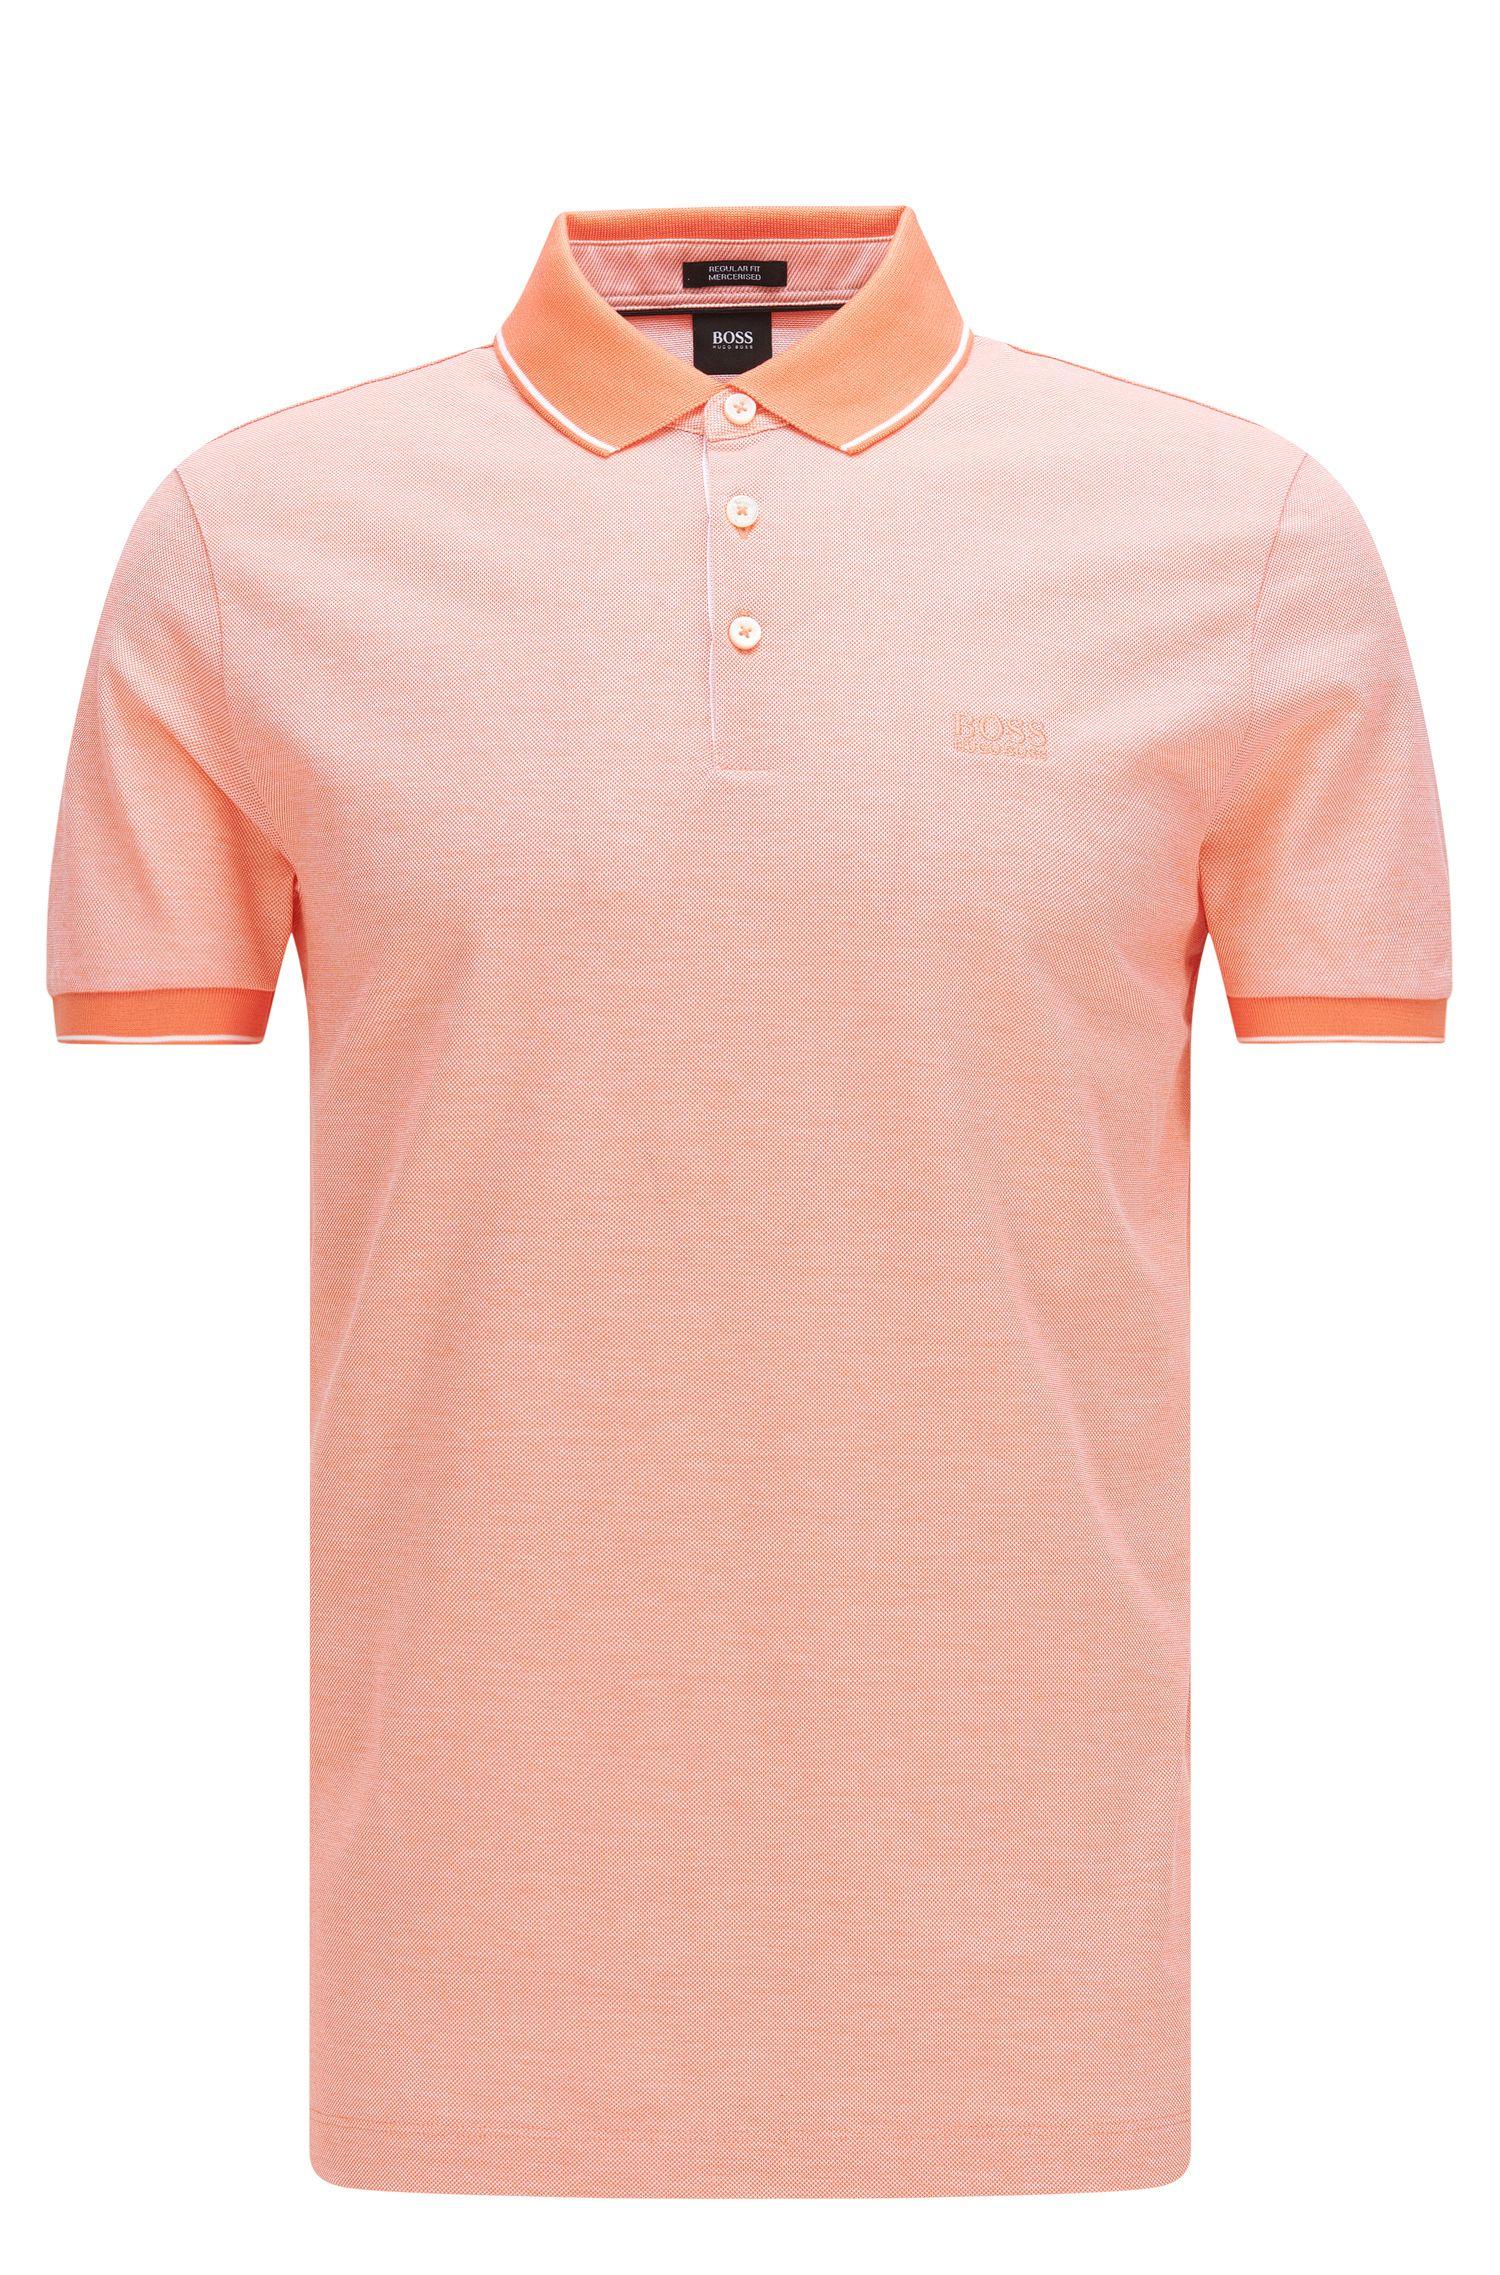 Regular-Fit Poloshirt aus veredelter Baumwolle: 'Prout 01'